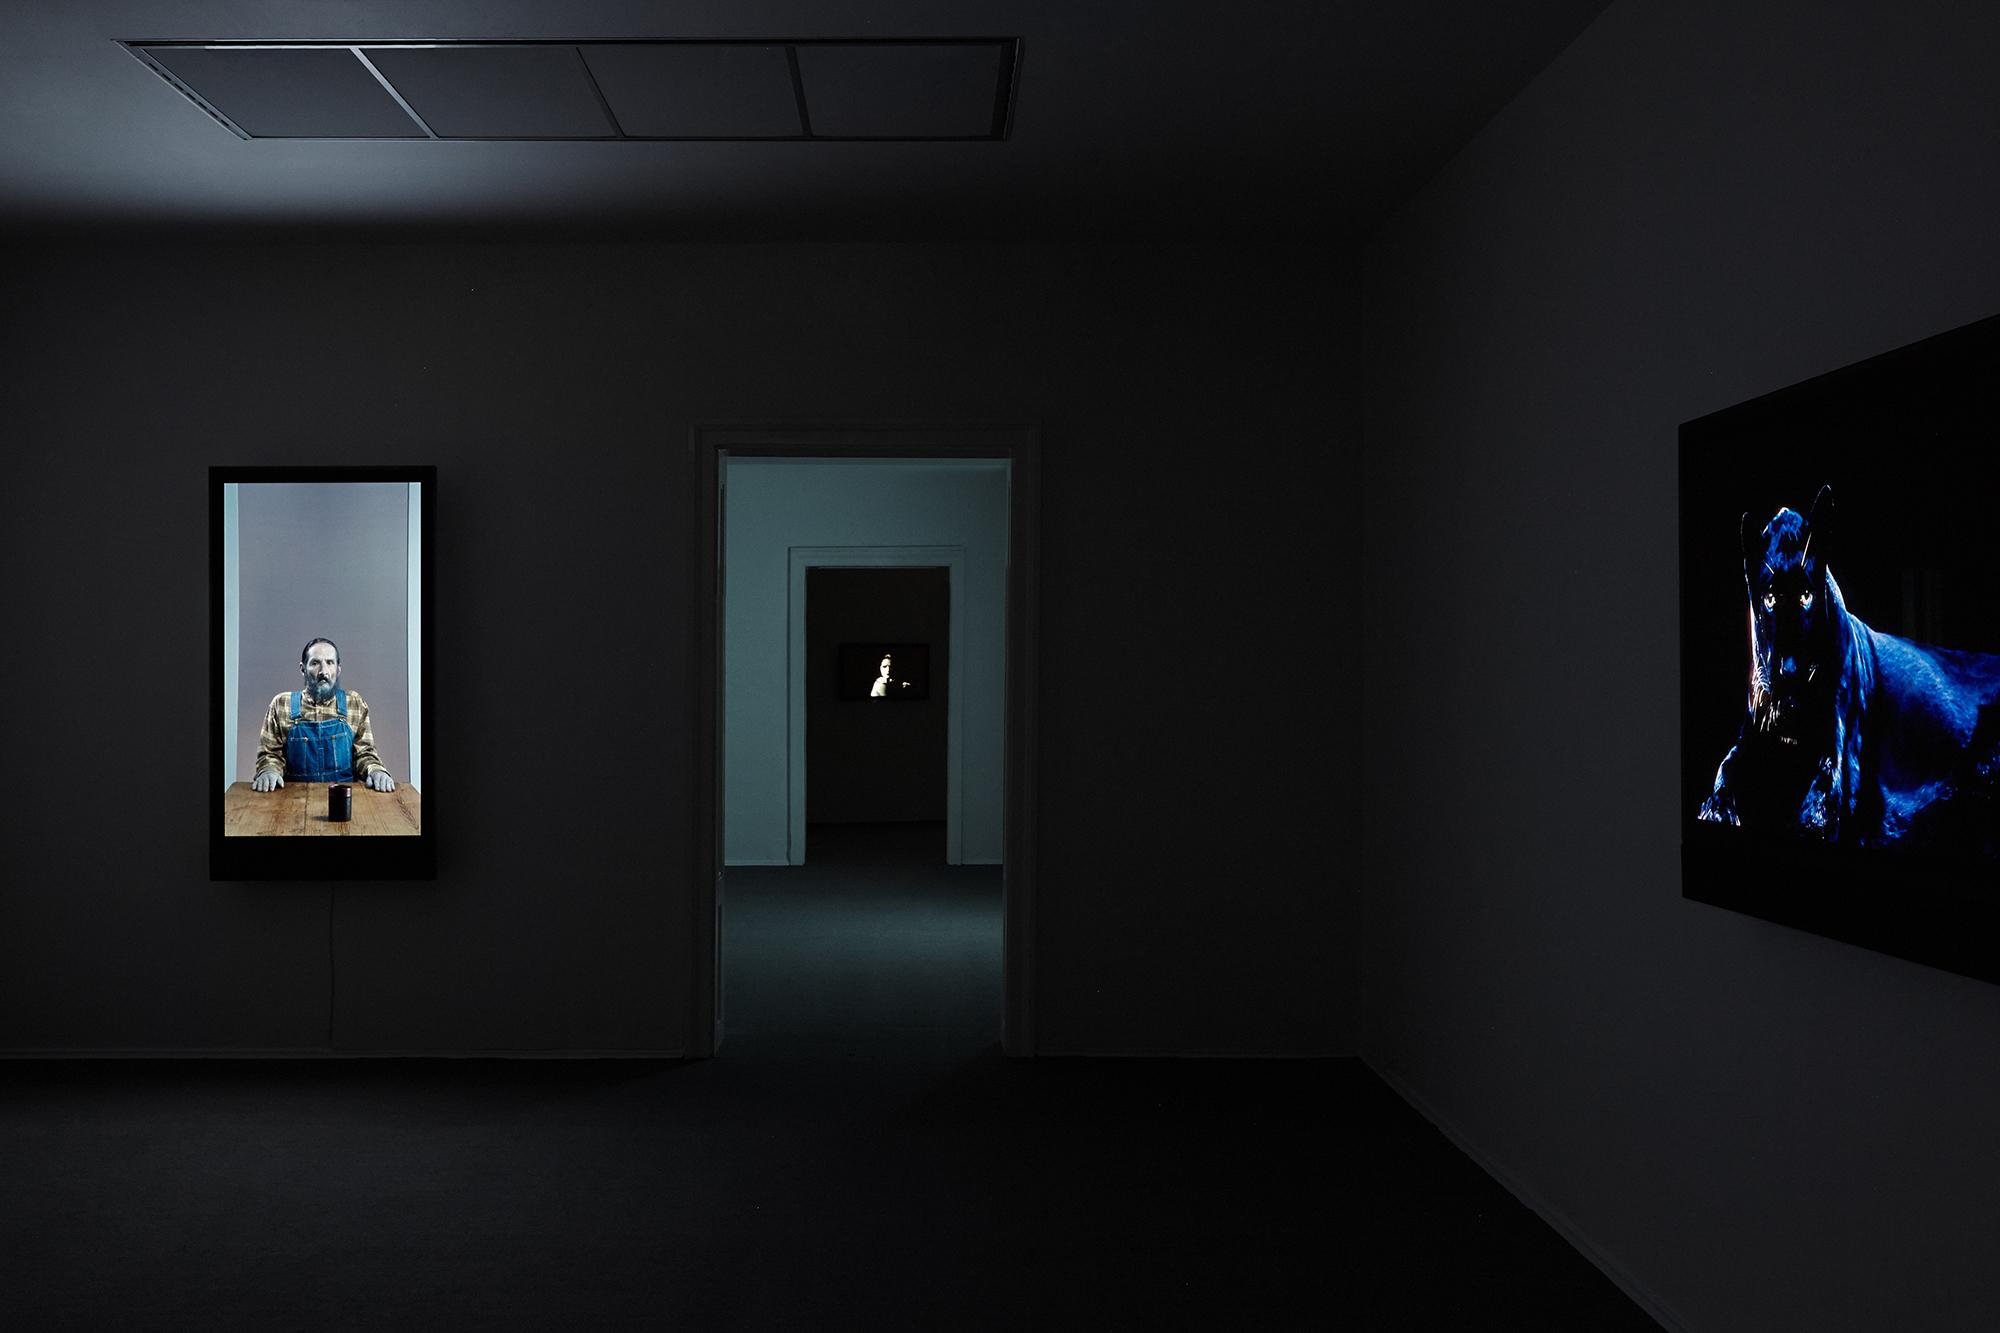 Robert_Willson_exhibition_23.jpg